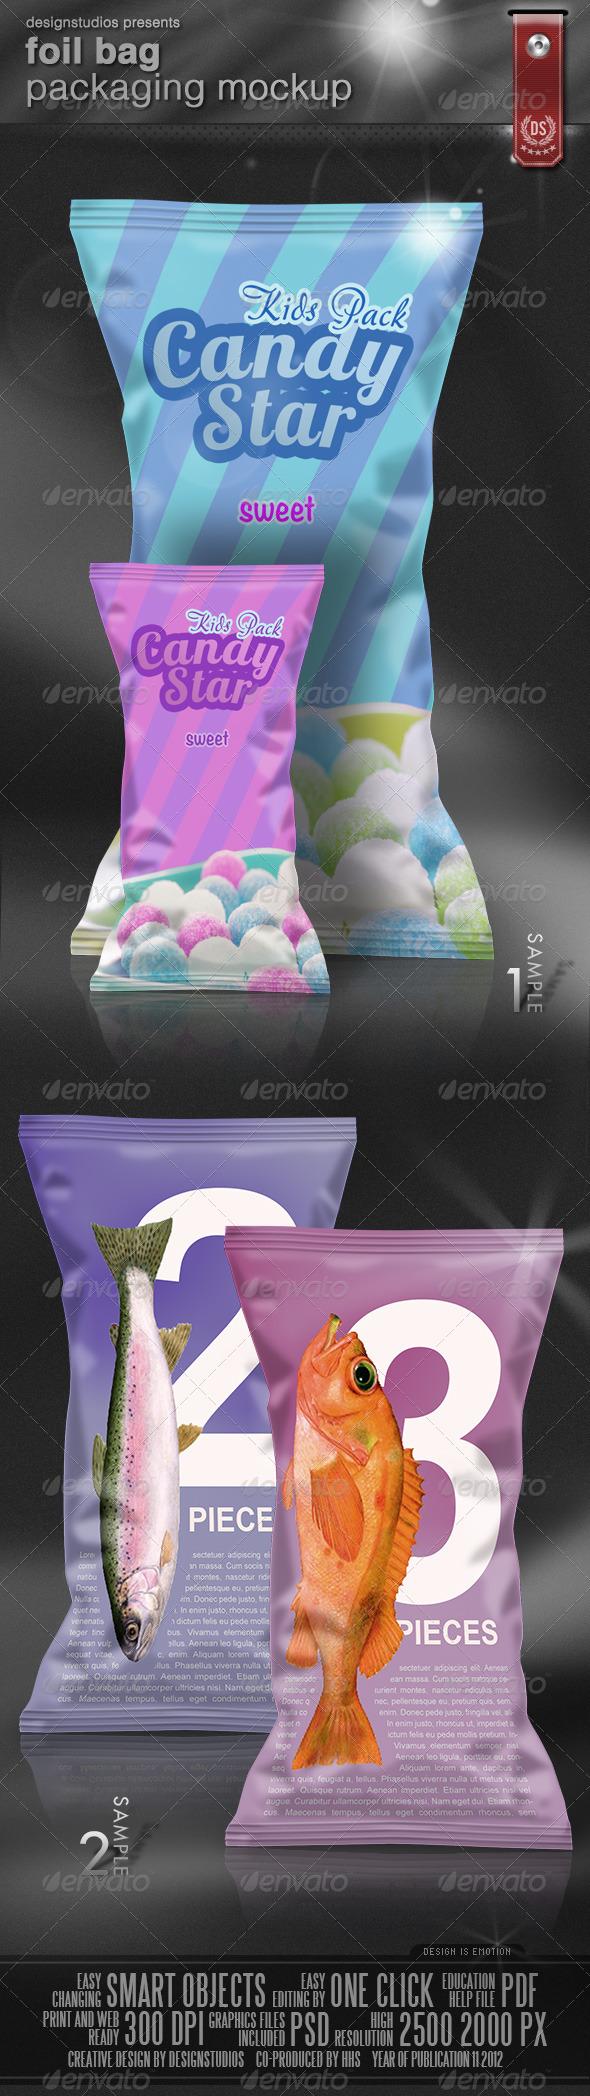 Foil Bag Packaging Mock-Up - Food and Drink Packaging